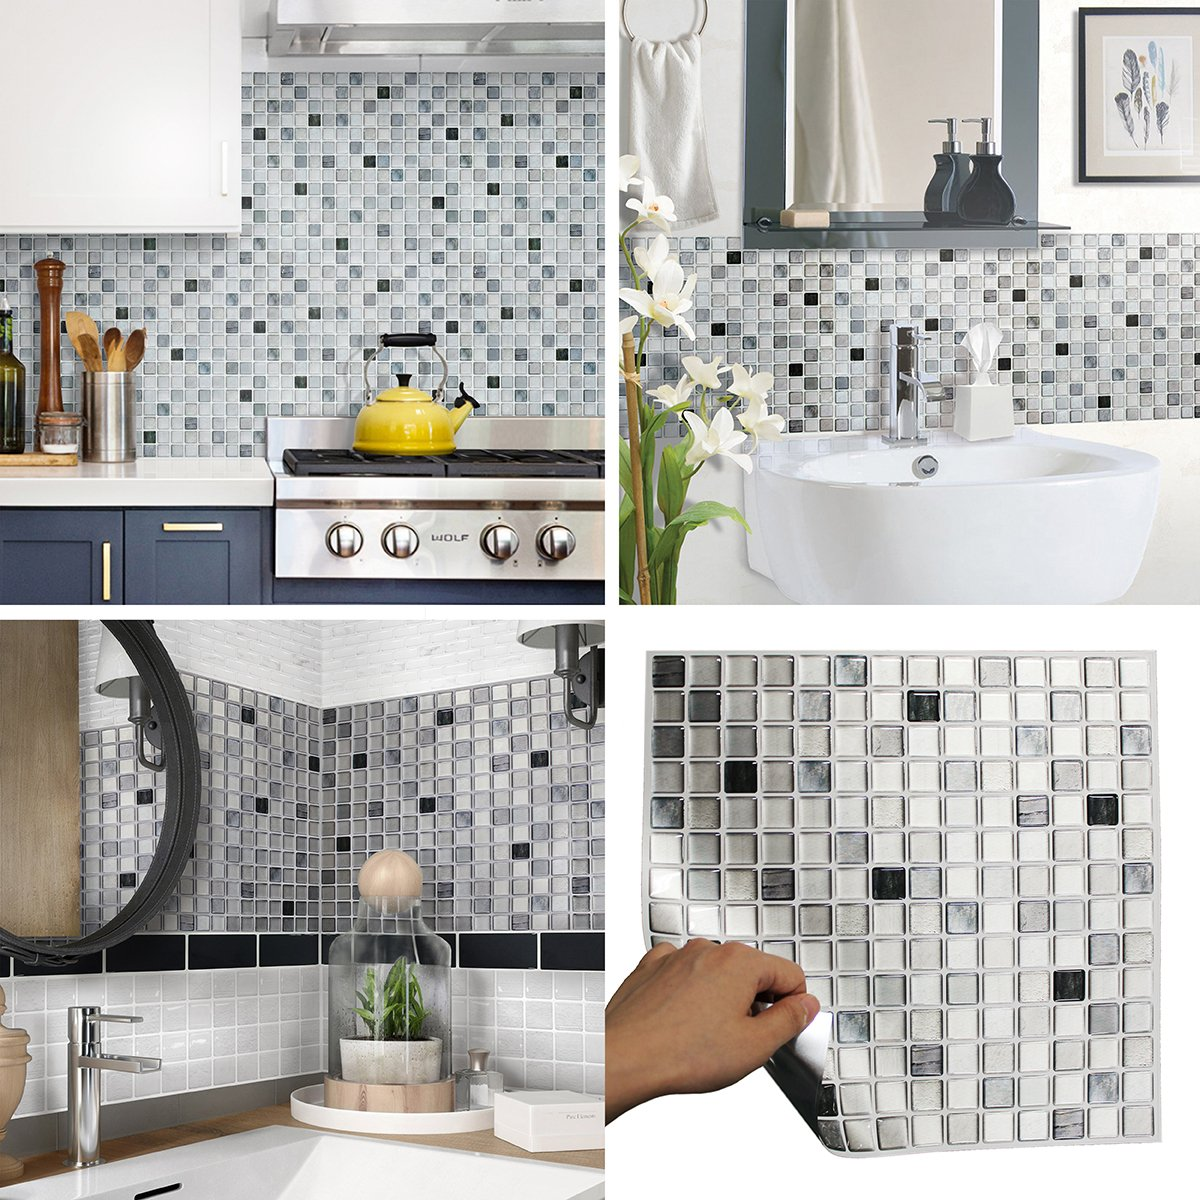 BEAUSTILE Decorative Tile Stickers Peel Stick Backsplash Fire Retardant Tile Sheet (Monocrome) (10, 12.2'' x 12.2'')